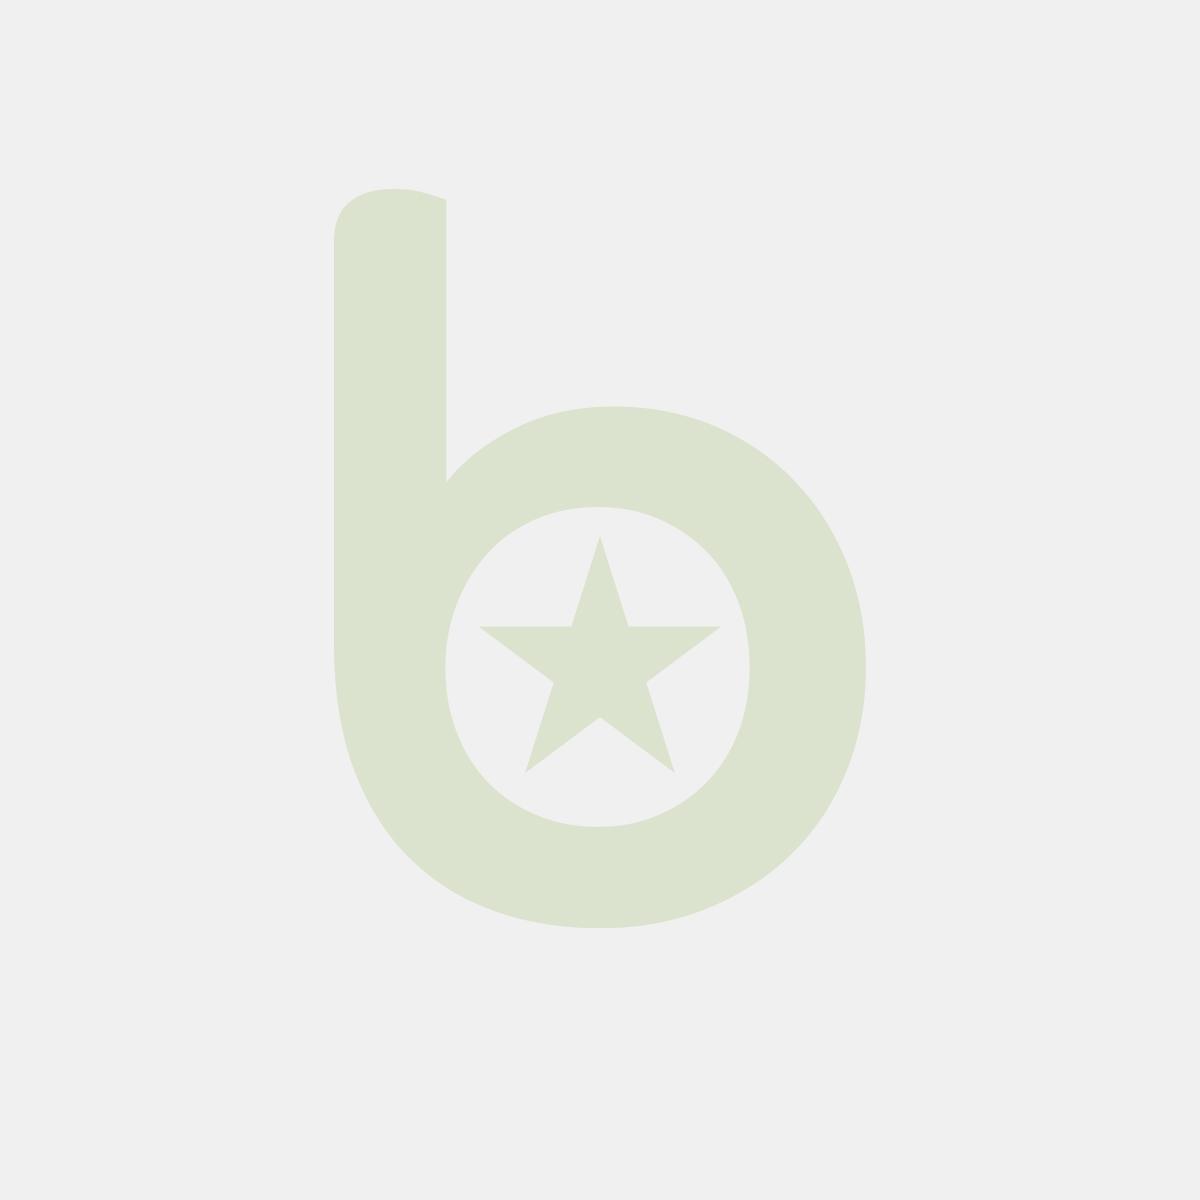 Obrus RC+ 20m/1,18m bordowy Royal Collection powlekany PLA